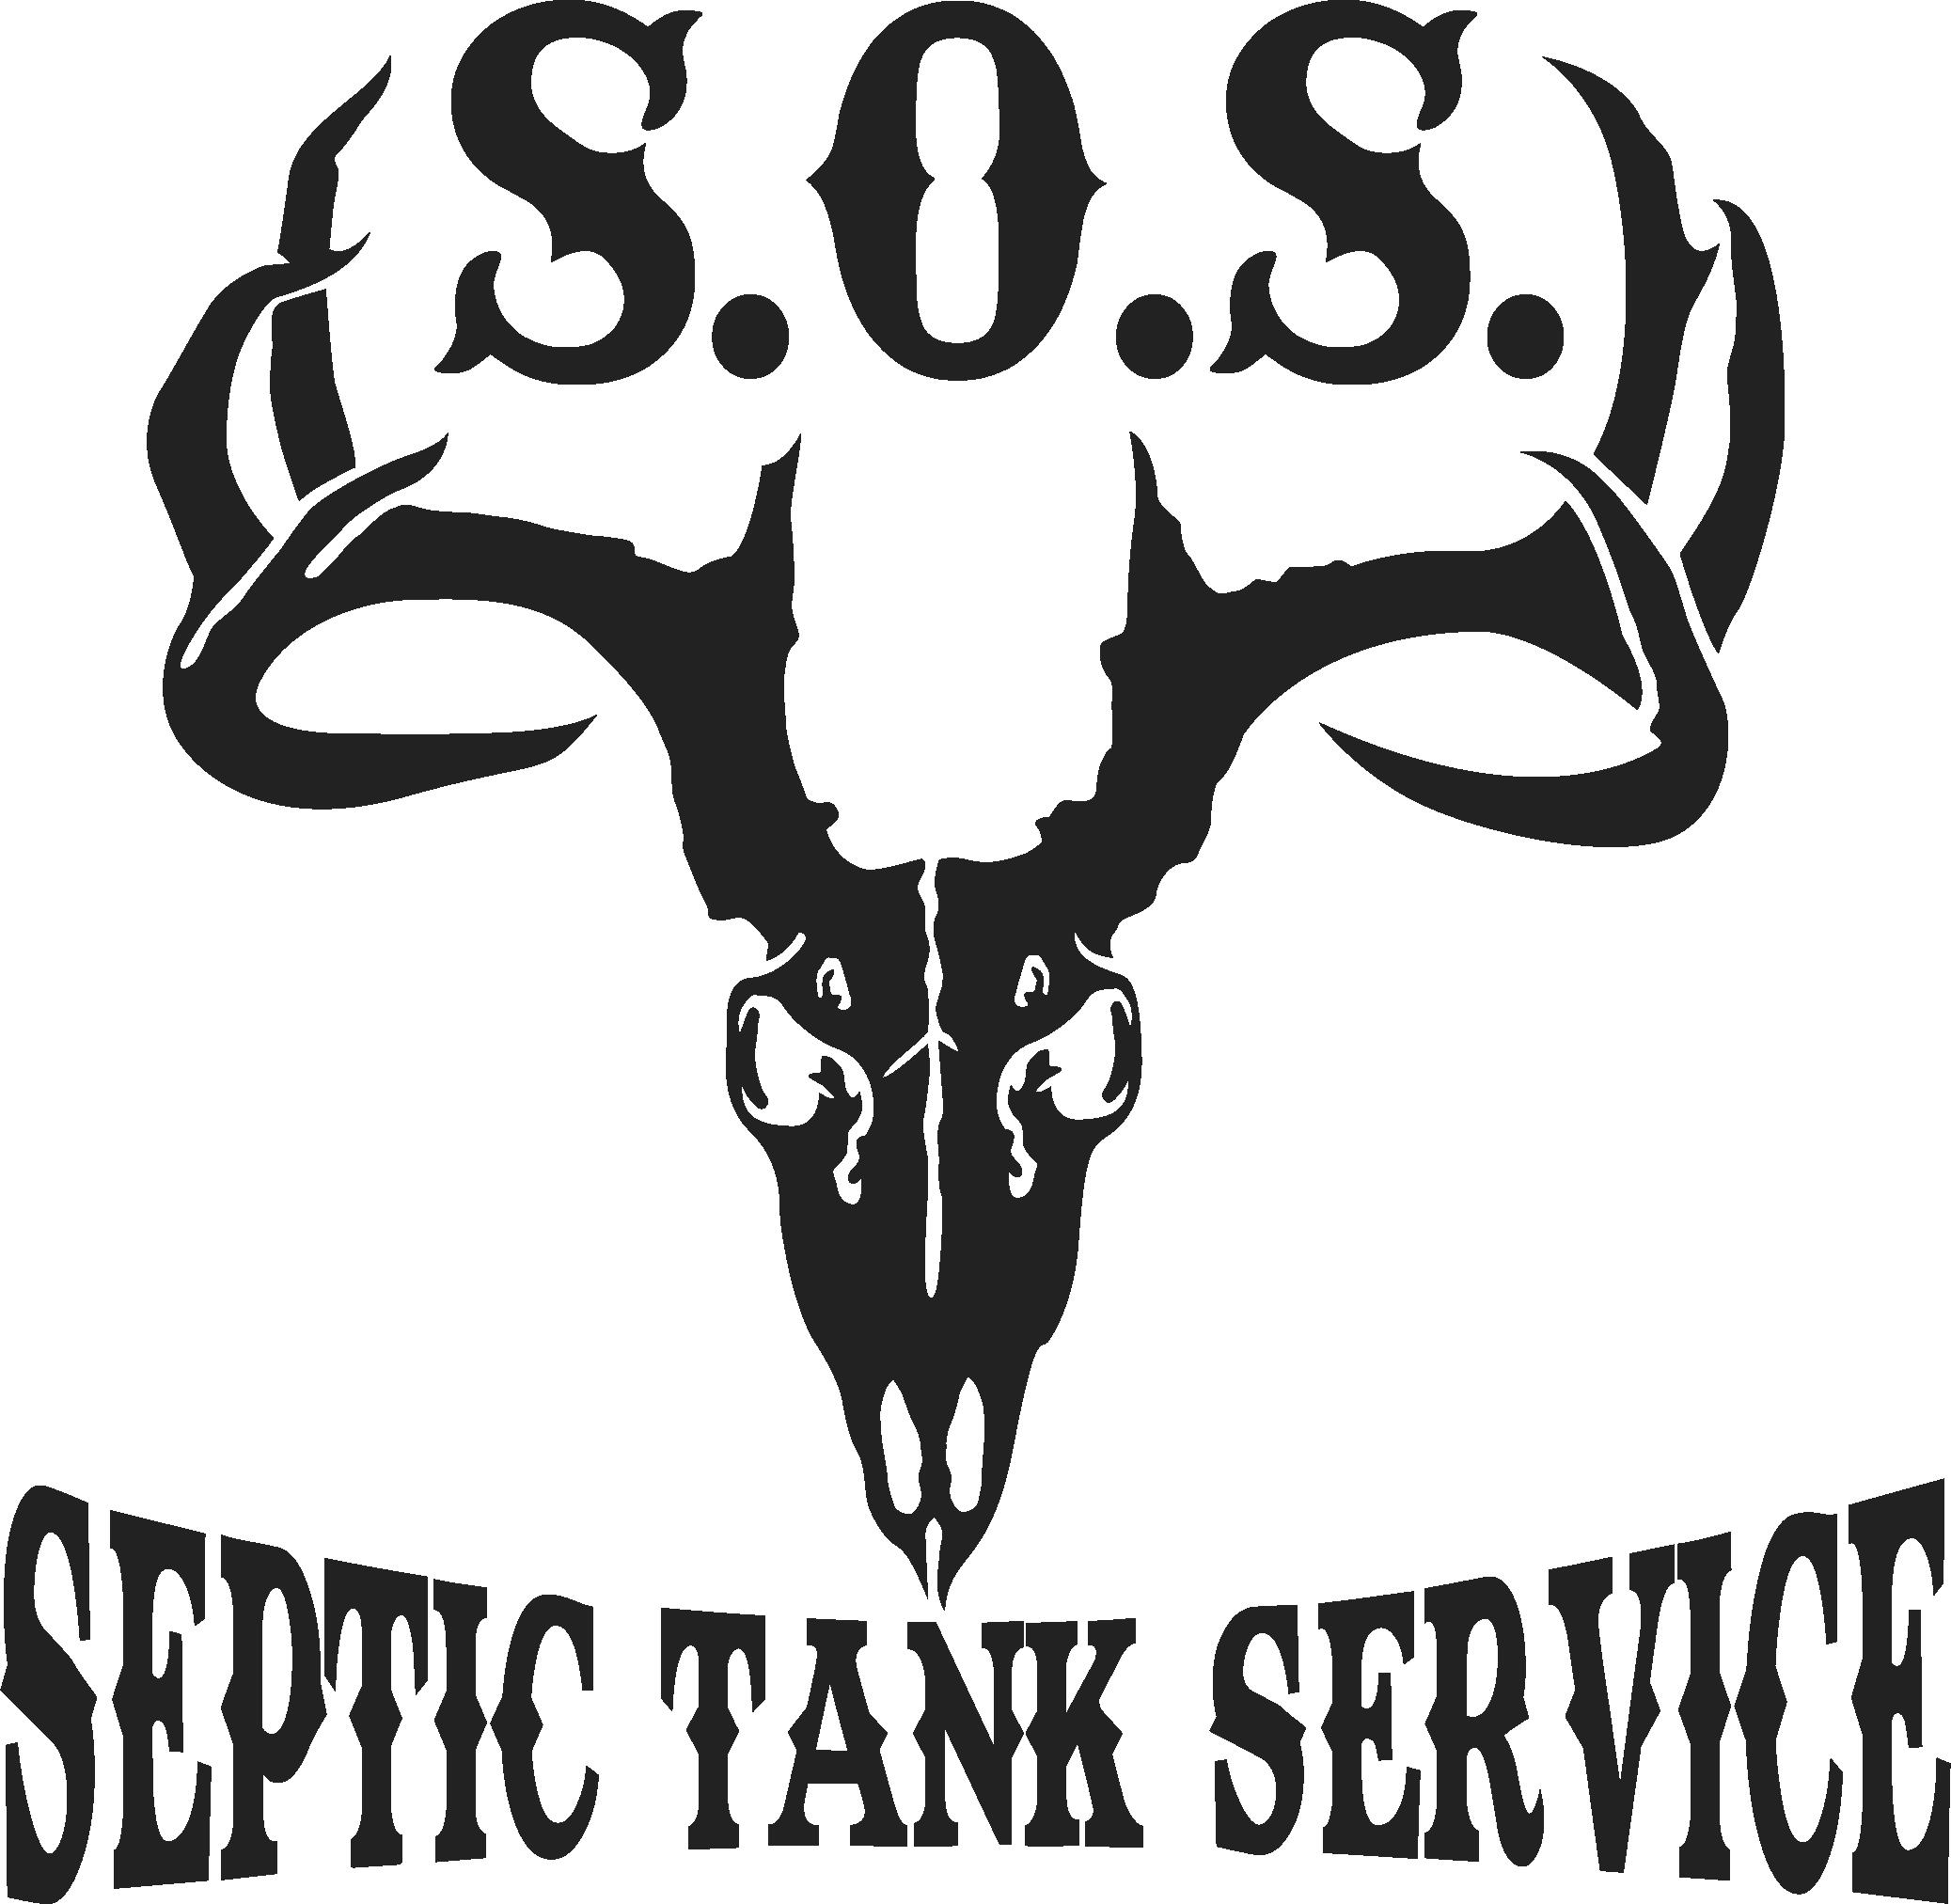 SOS Septic Tank Service